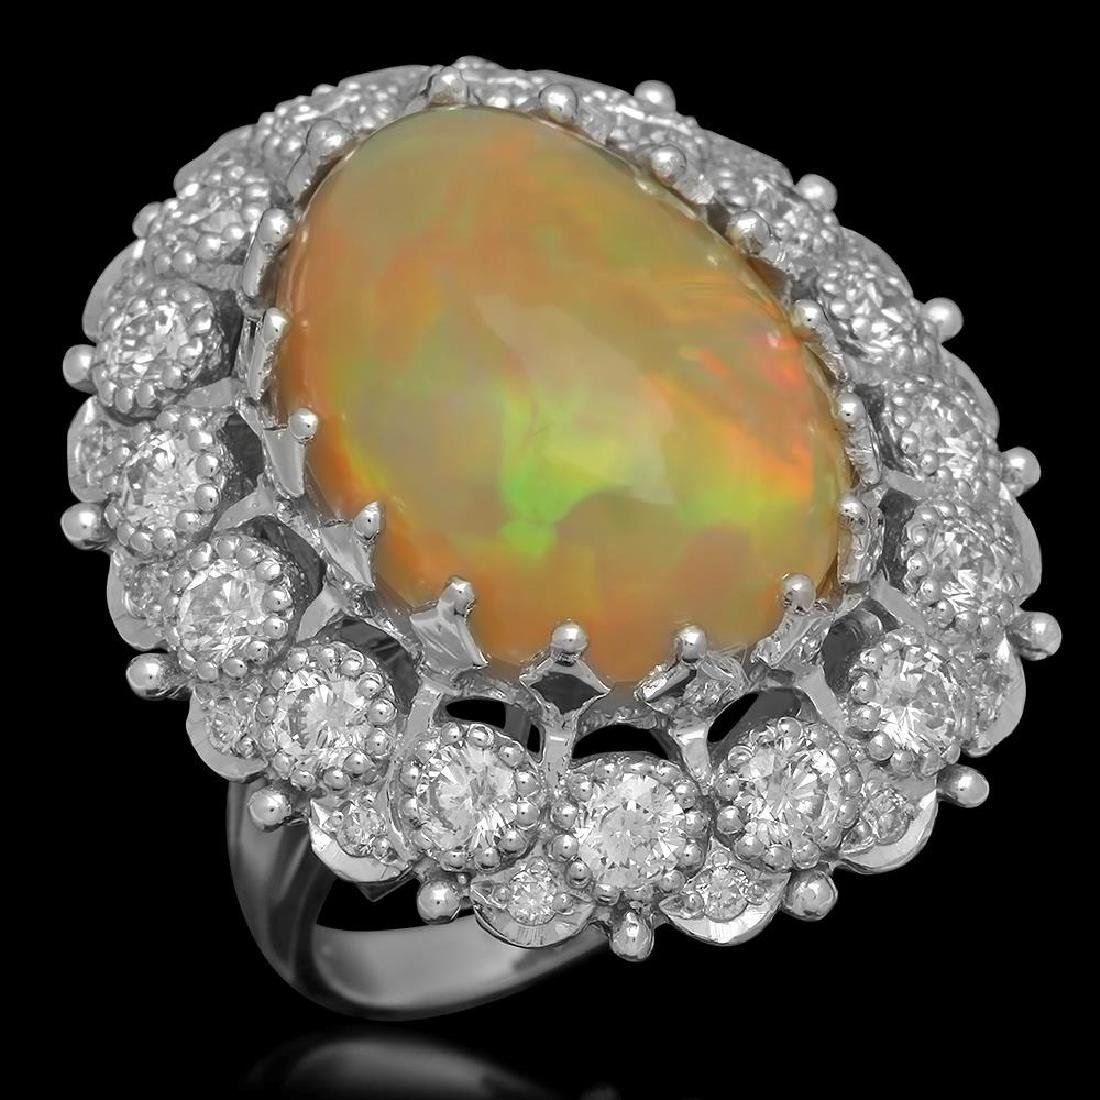 14K Gold 11.64ct Opal 2.89ct Diamond Ring